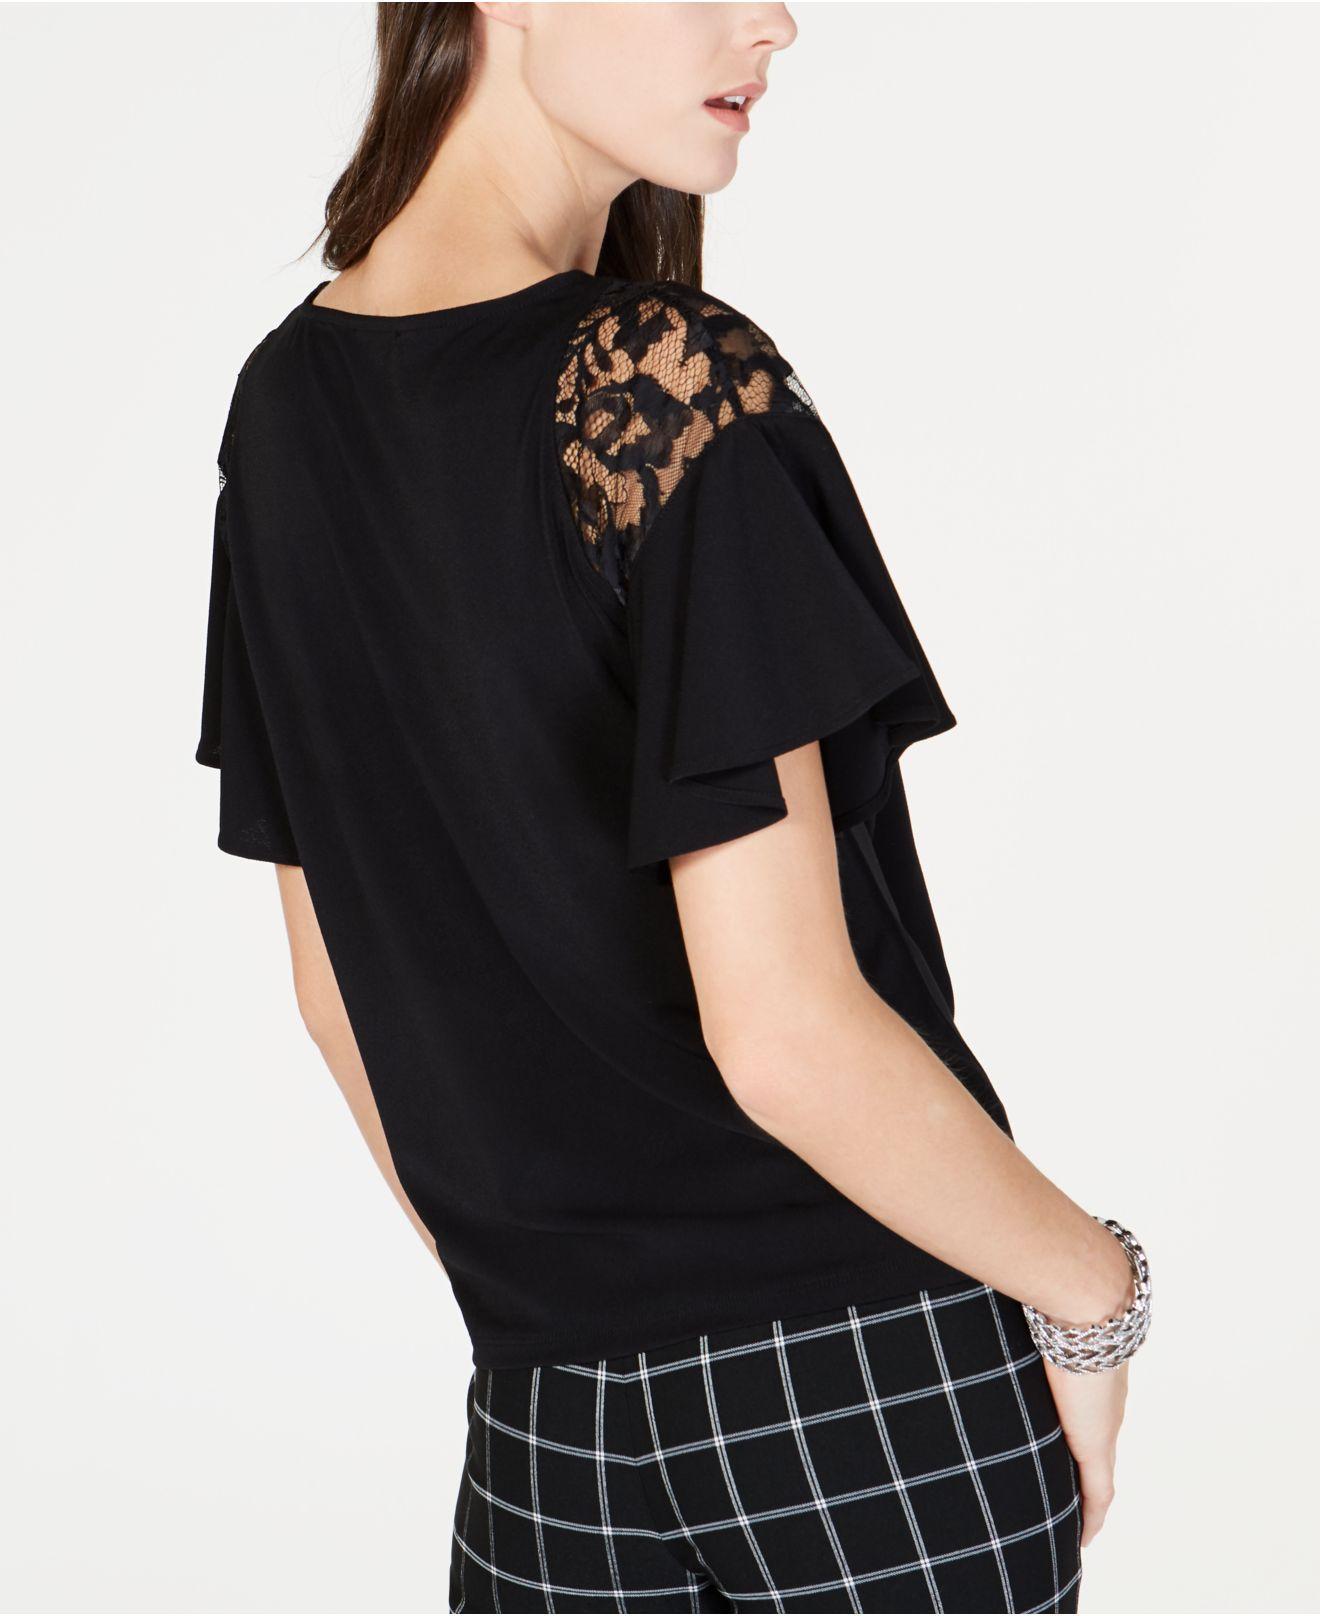 da8add36ba6b7 Lyst - INC International Concepts I.n.c. Short-sleeve Lace-detail Ruffle  Shirt